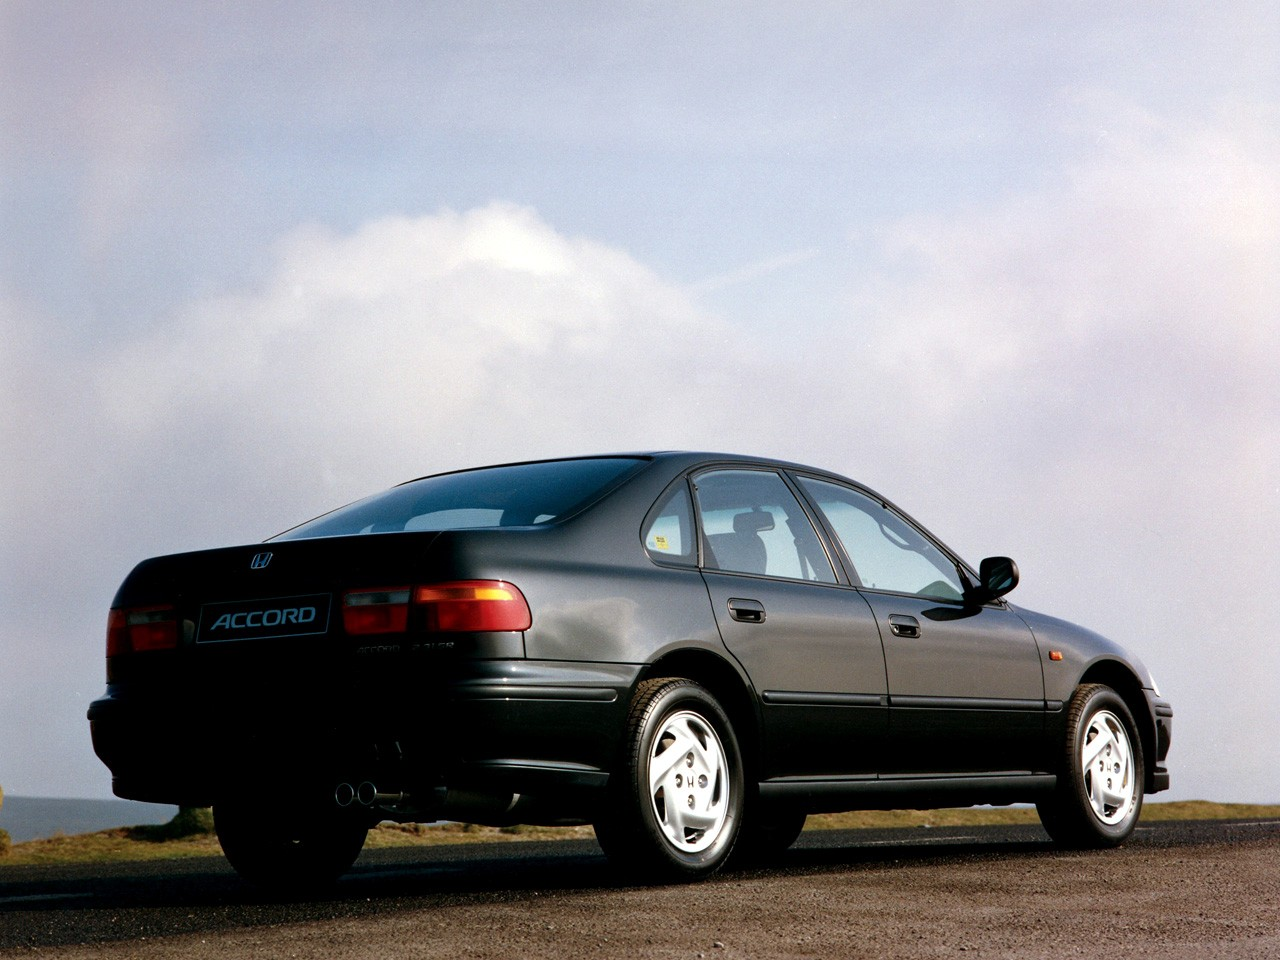 HONDA Accord 4 Doors specs & photos - 1993, 1994, 1995 ...